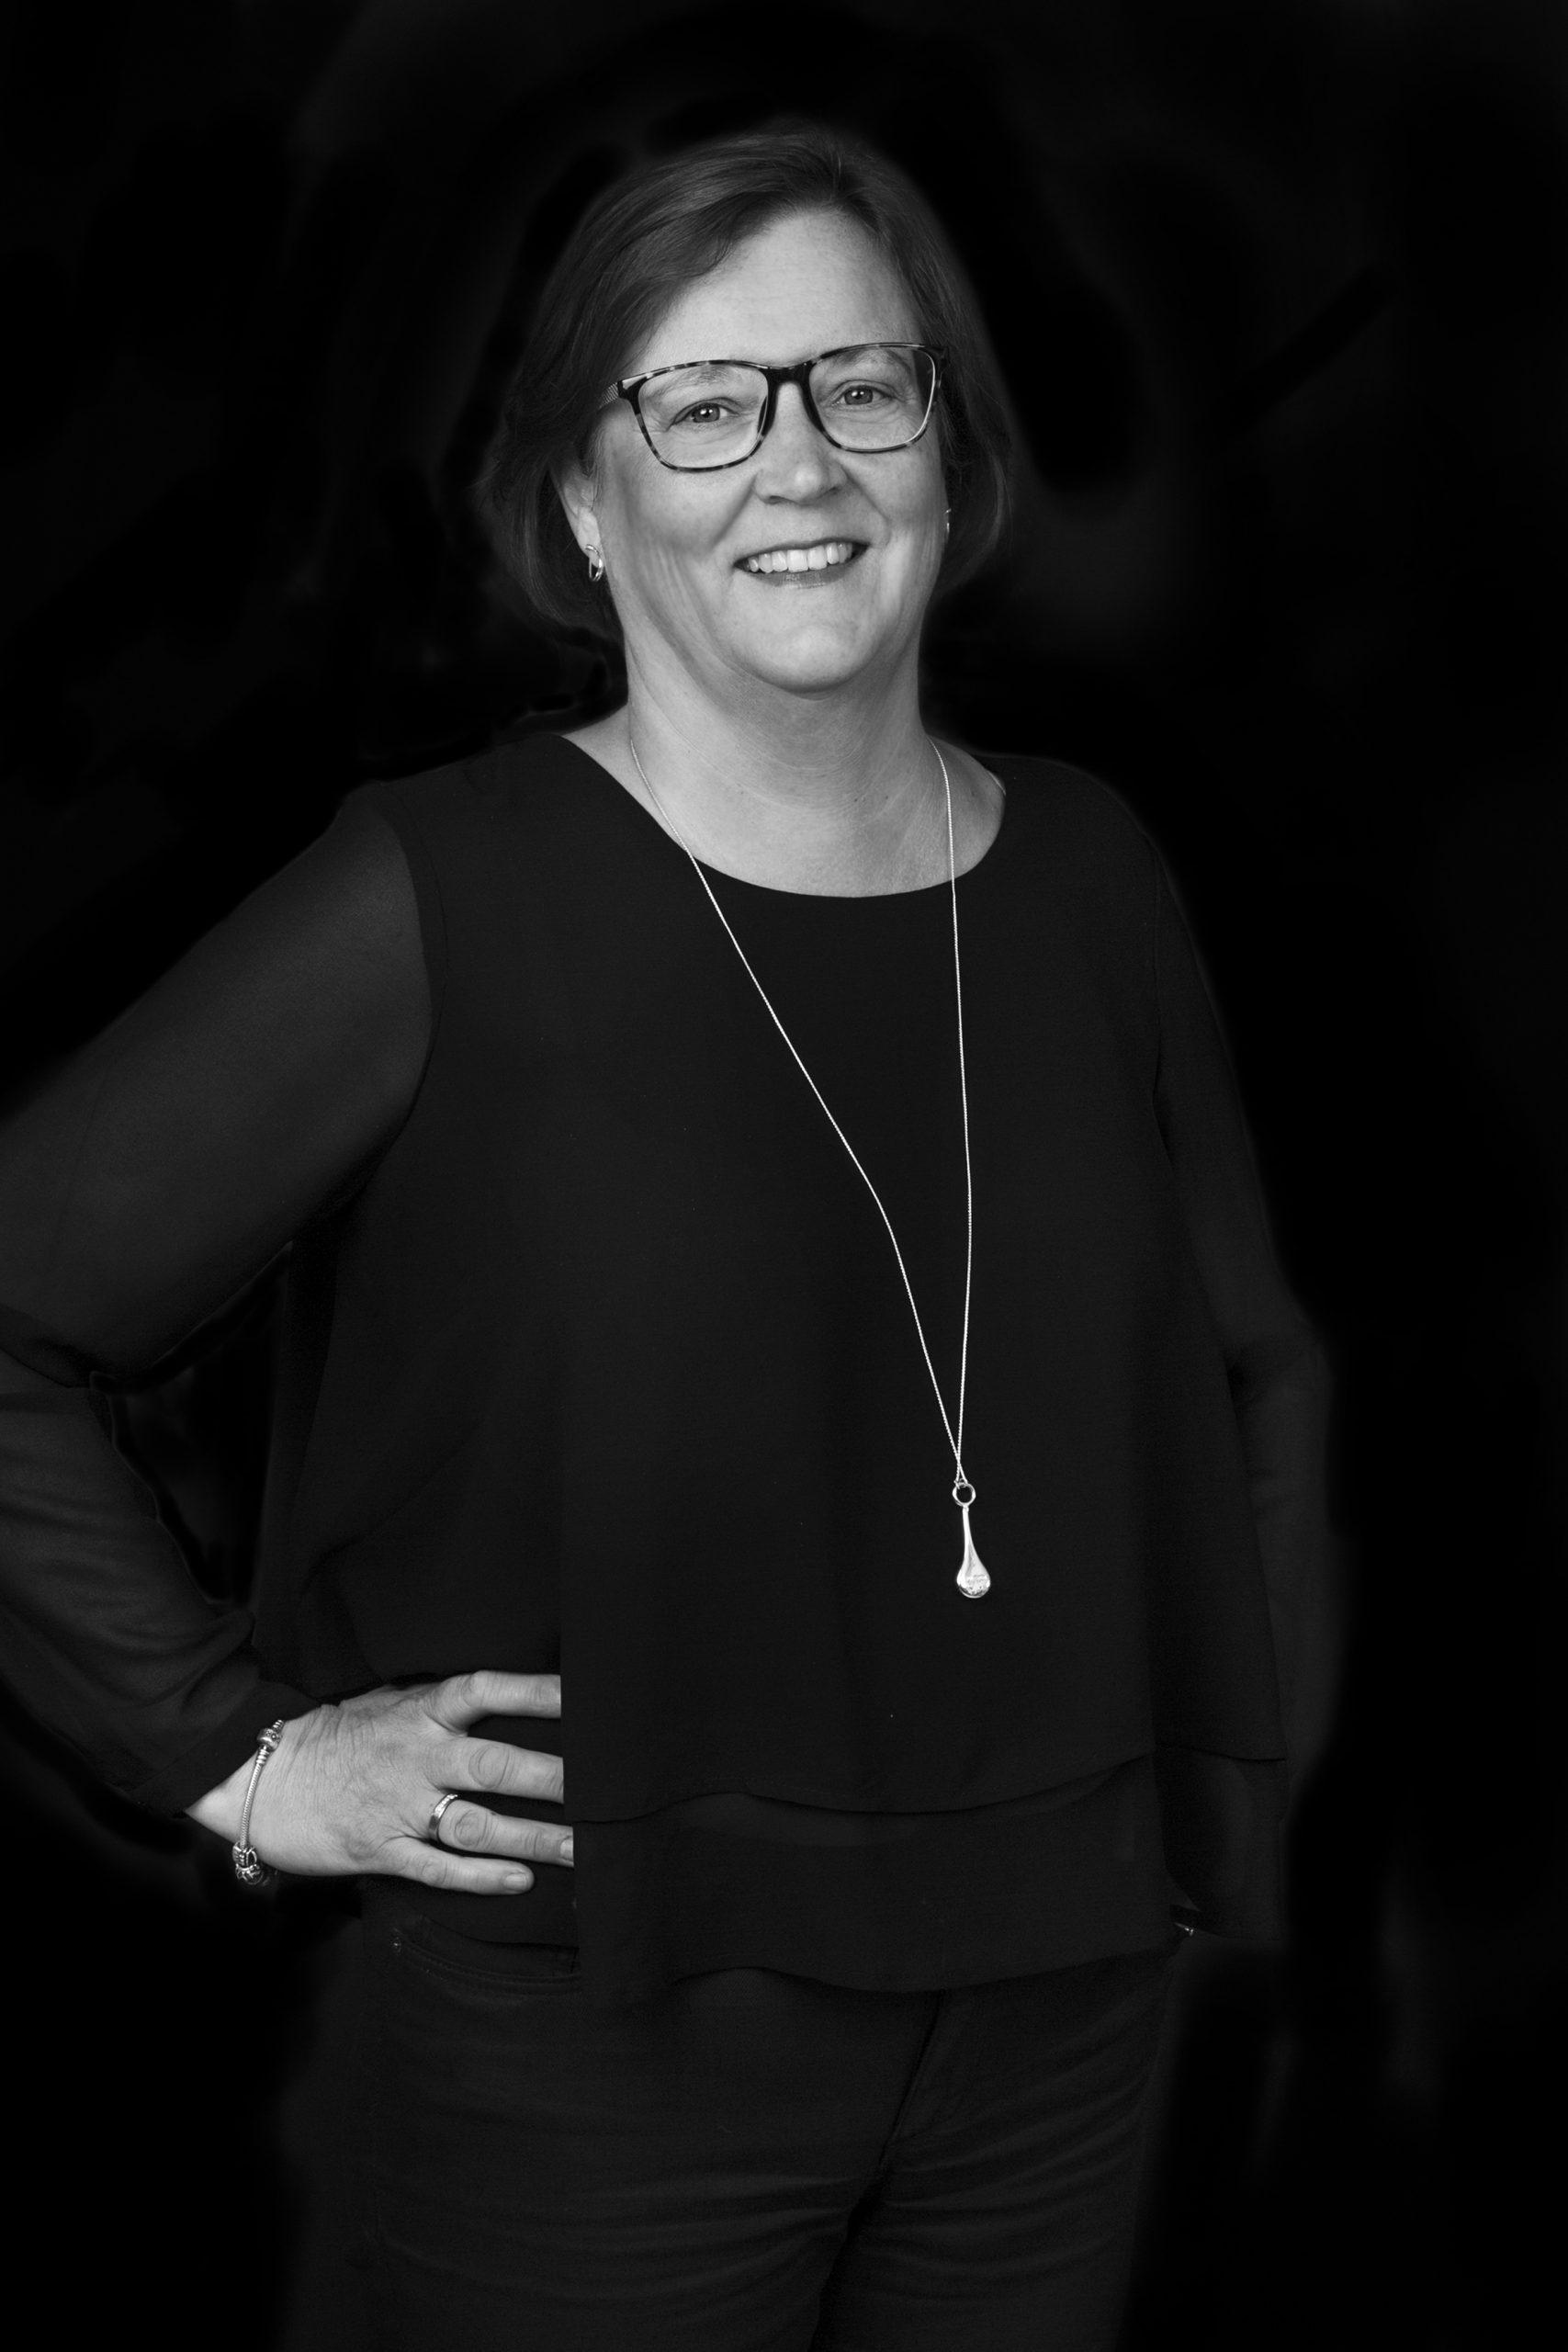 Karin Broman